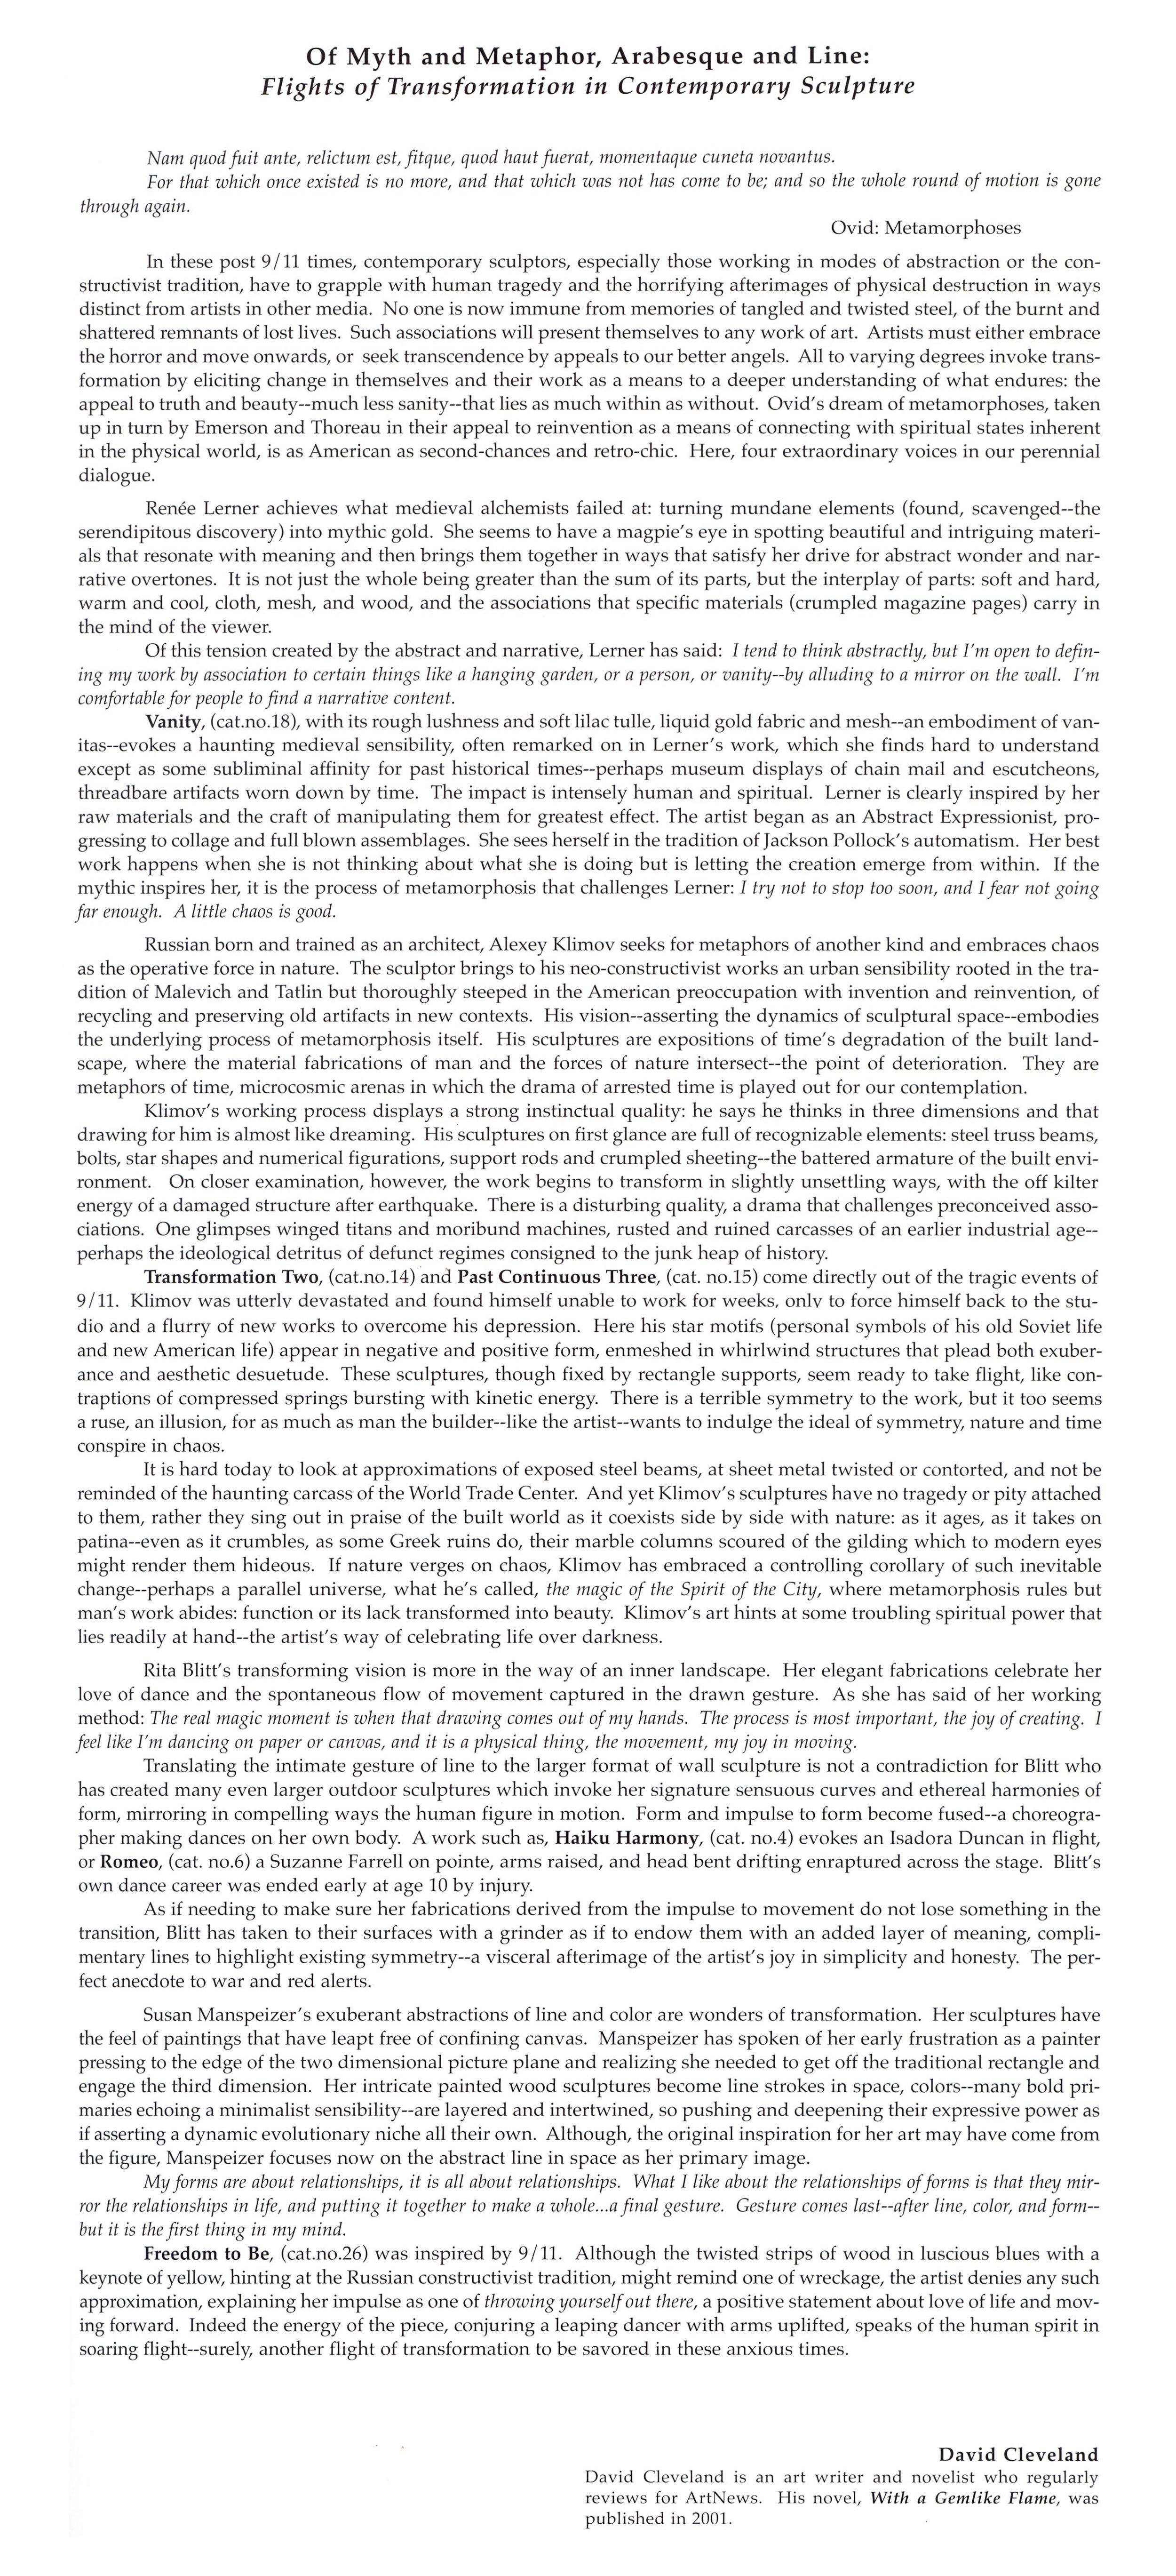 pg2 copy.jpg